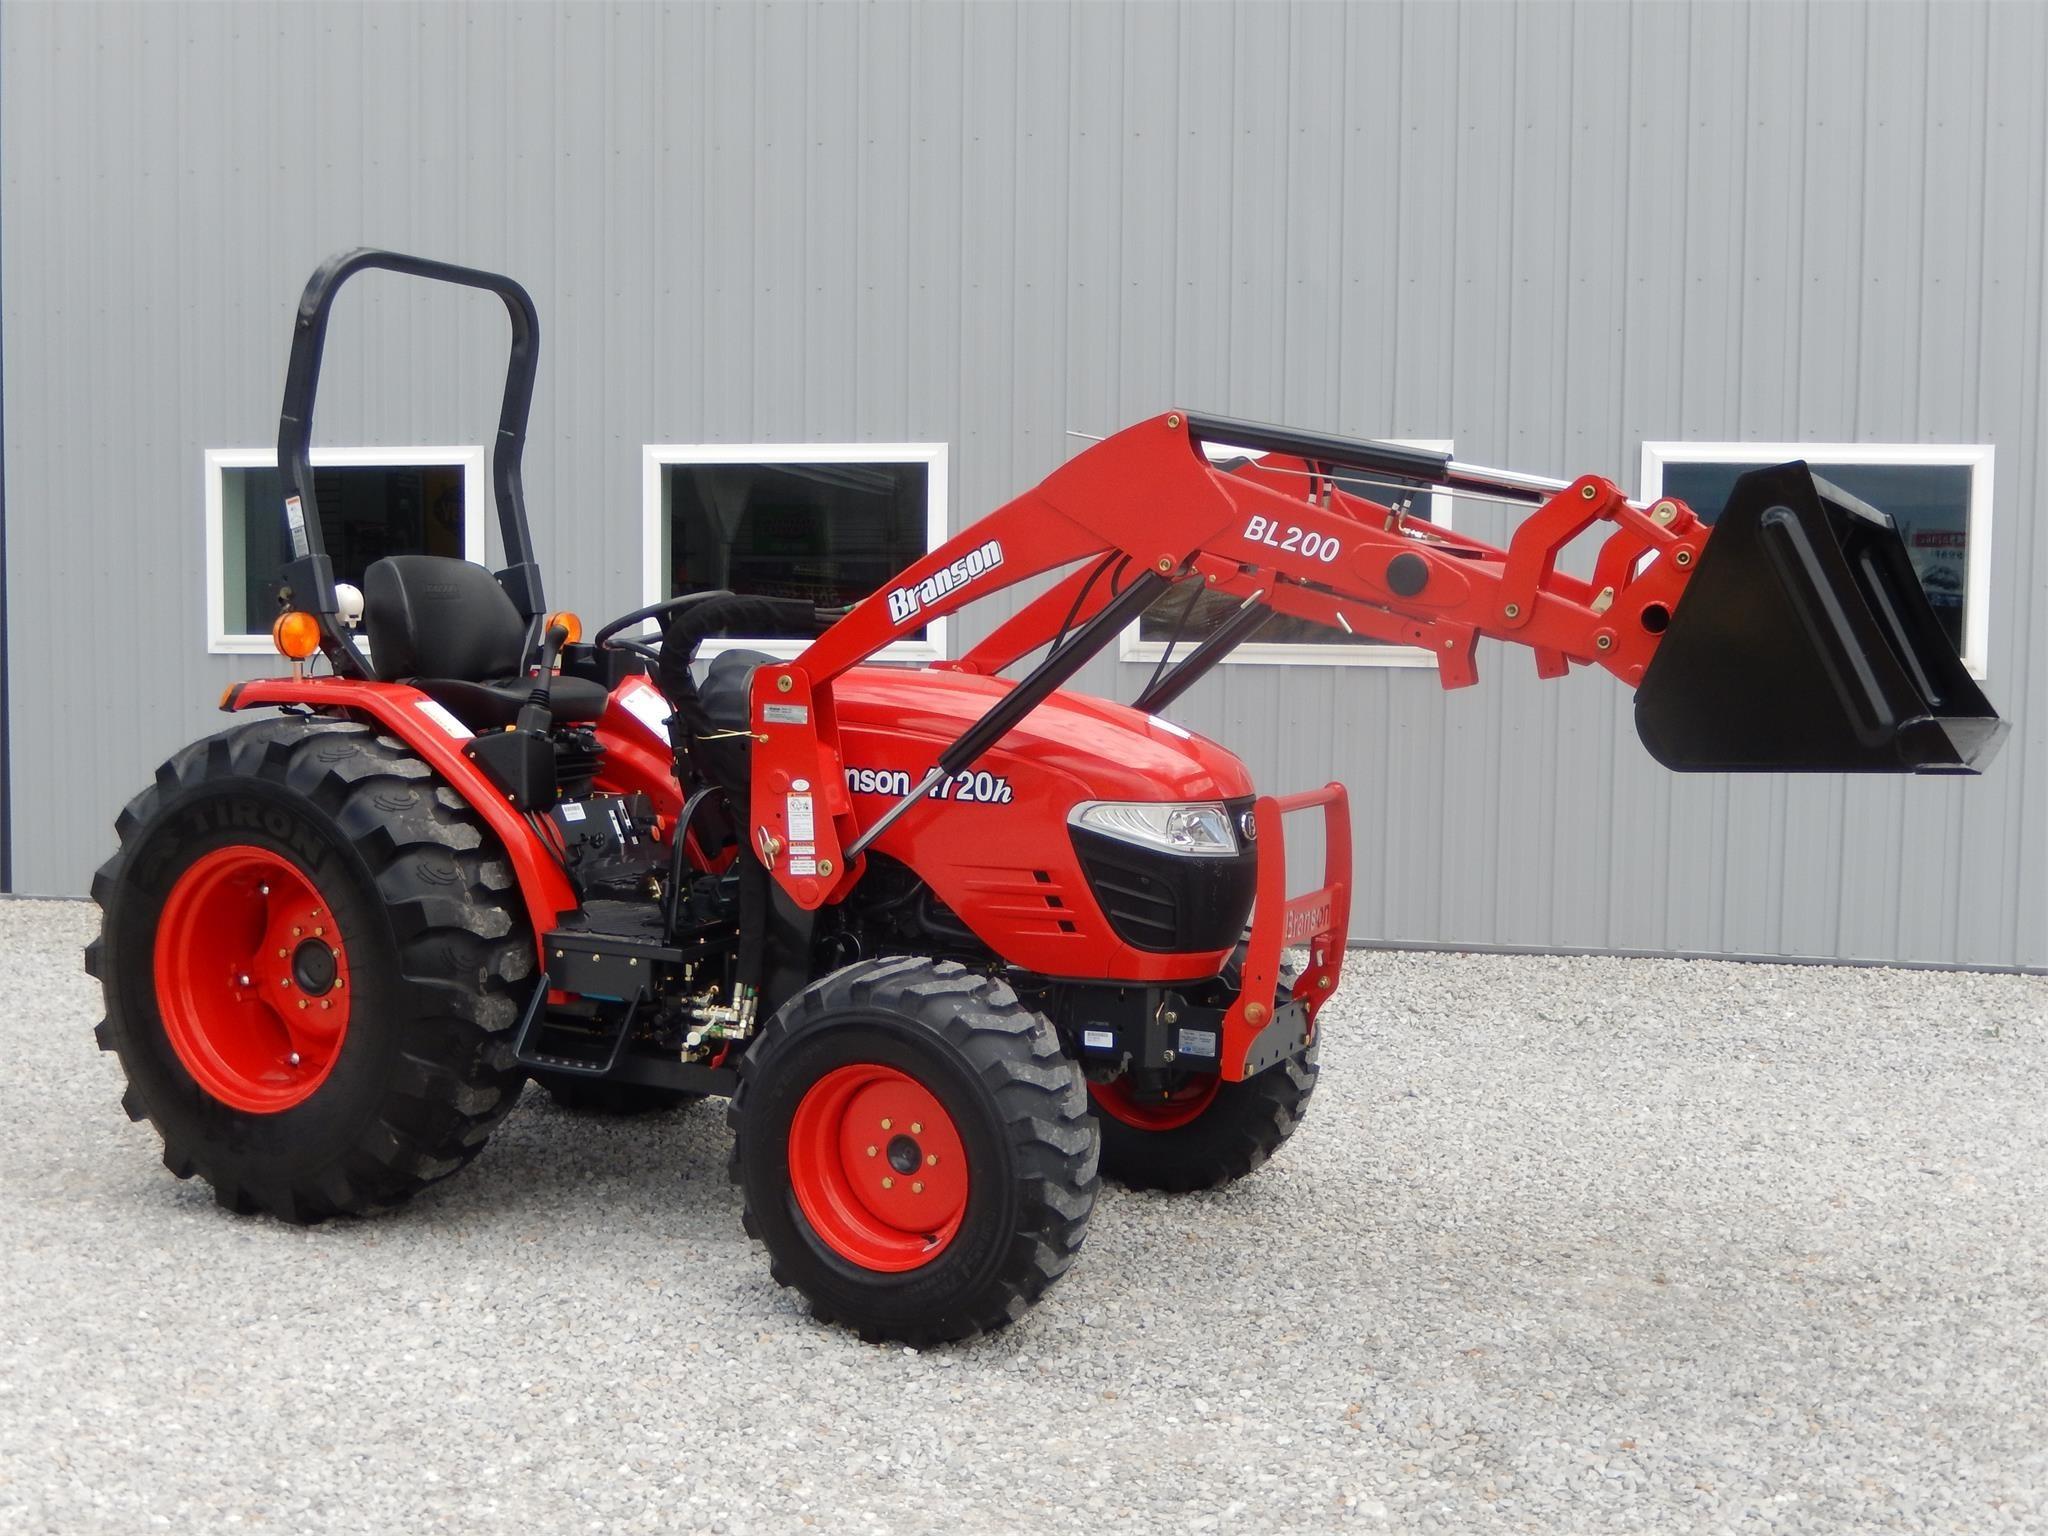 2020 Branson 4720H Tractor